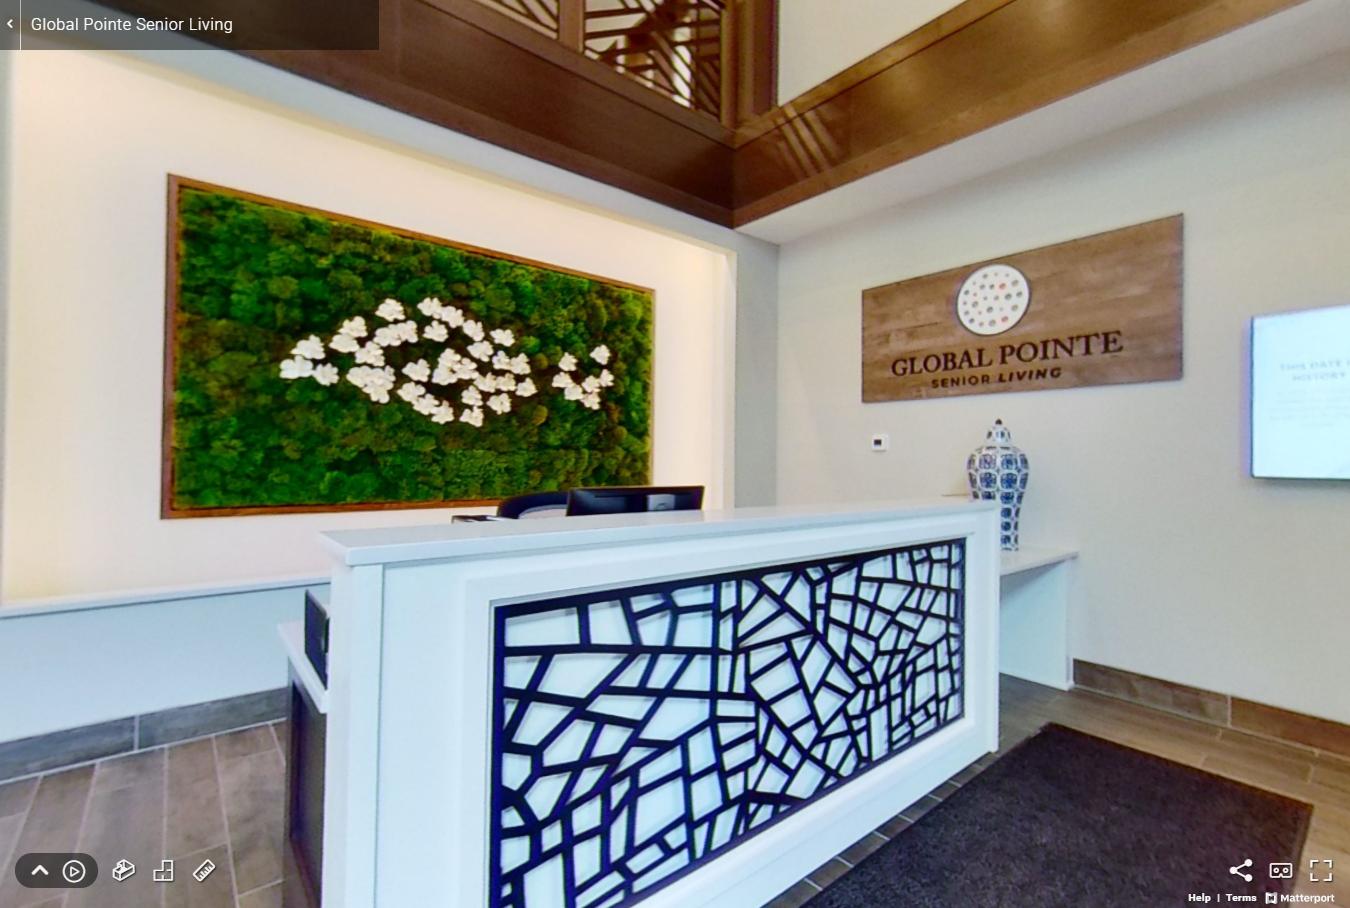 senior living assisted living apartments residence community lobby check in desk stylish modern